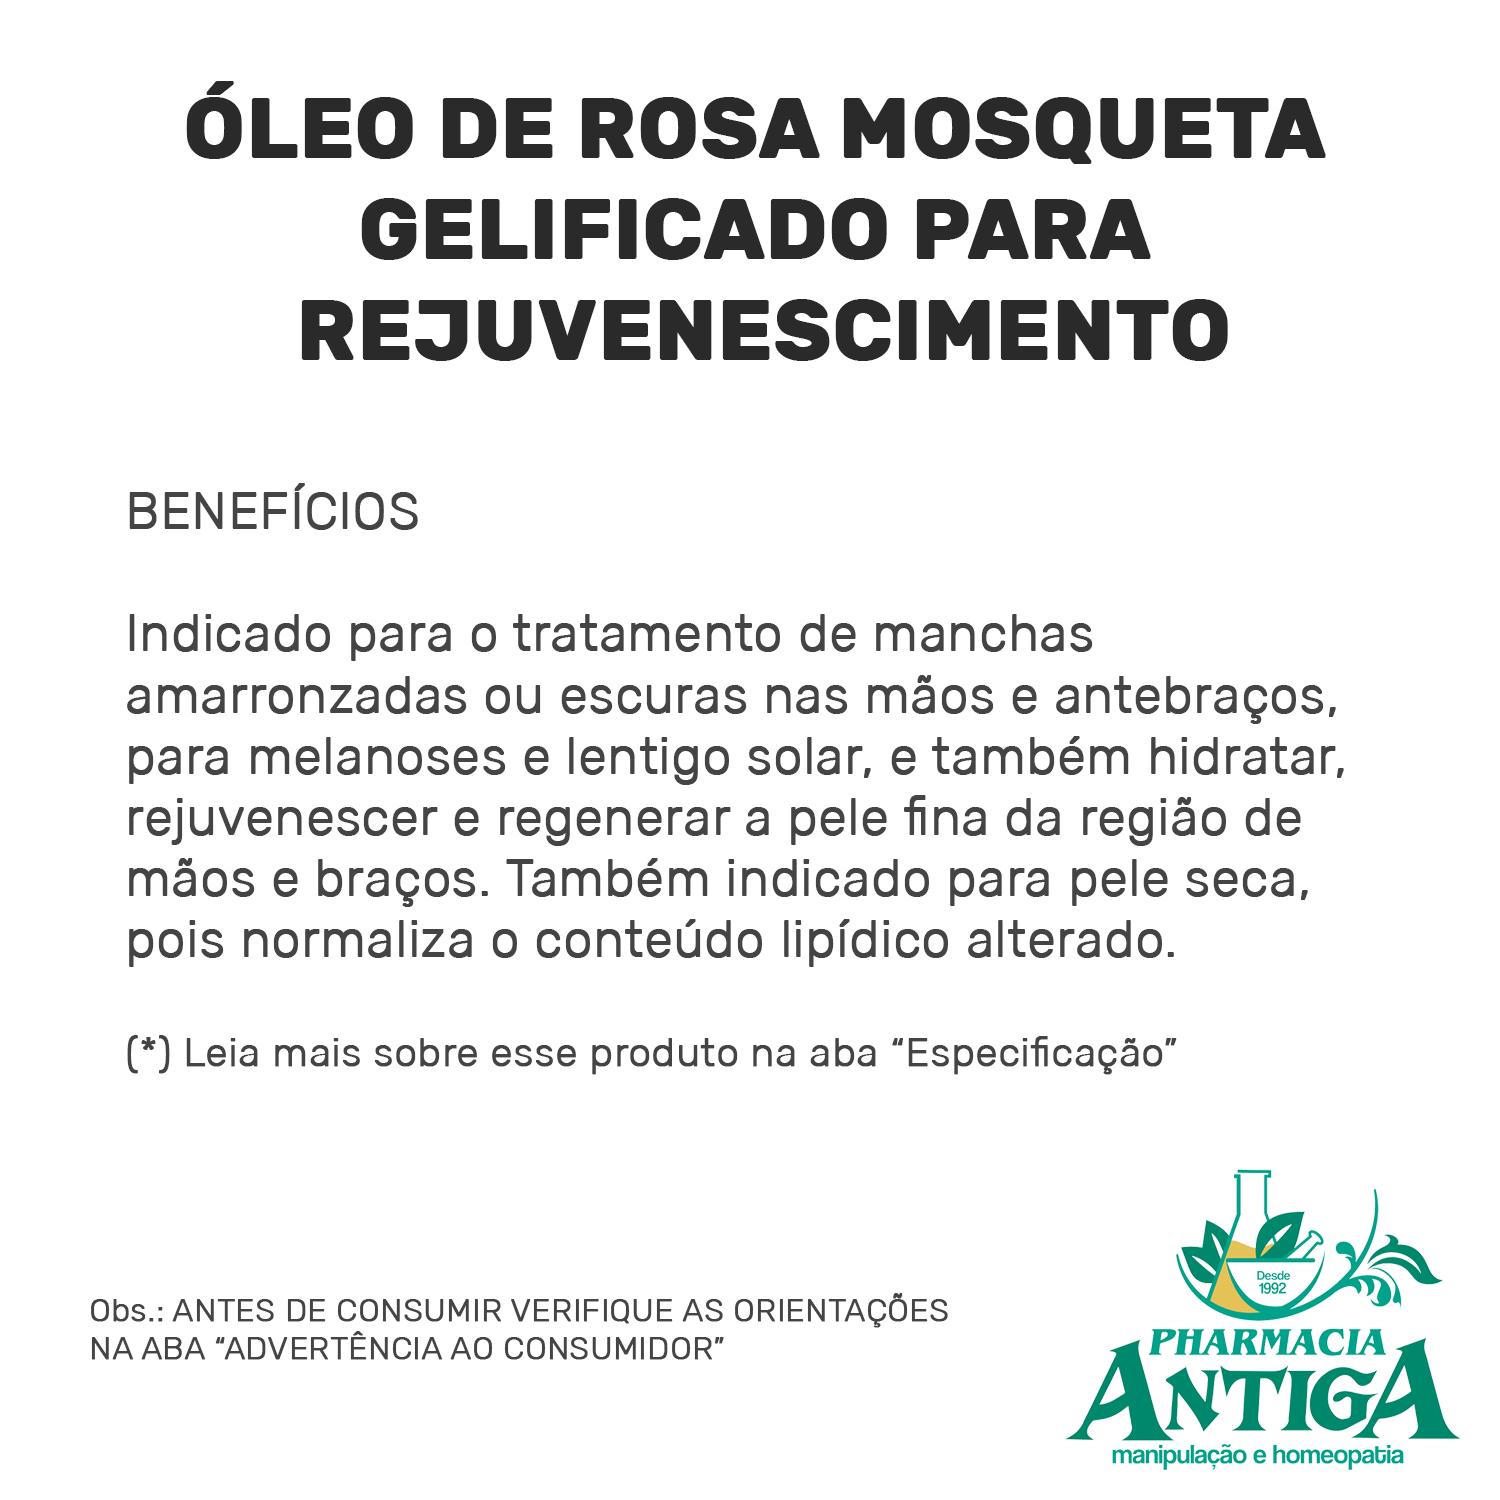 ÓLEO DE ROSA MOSQUETA GELIFICADO PARA REJUVENESCIMENTO